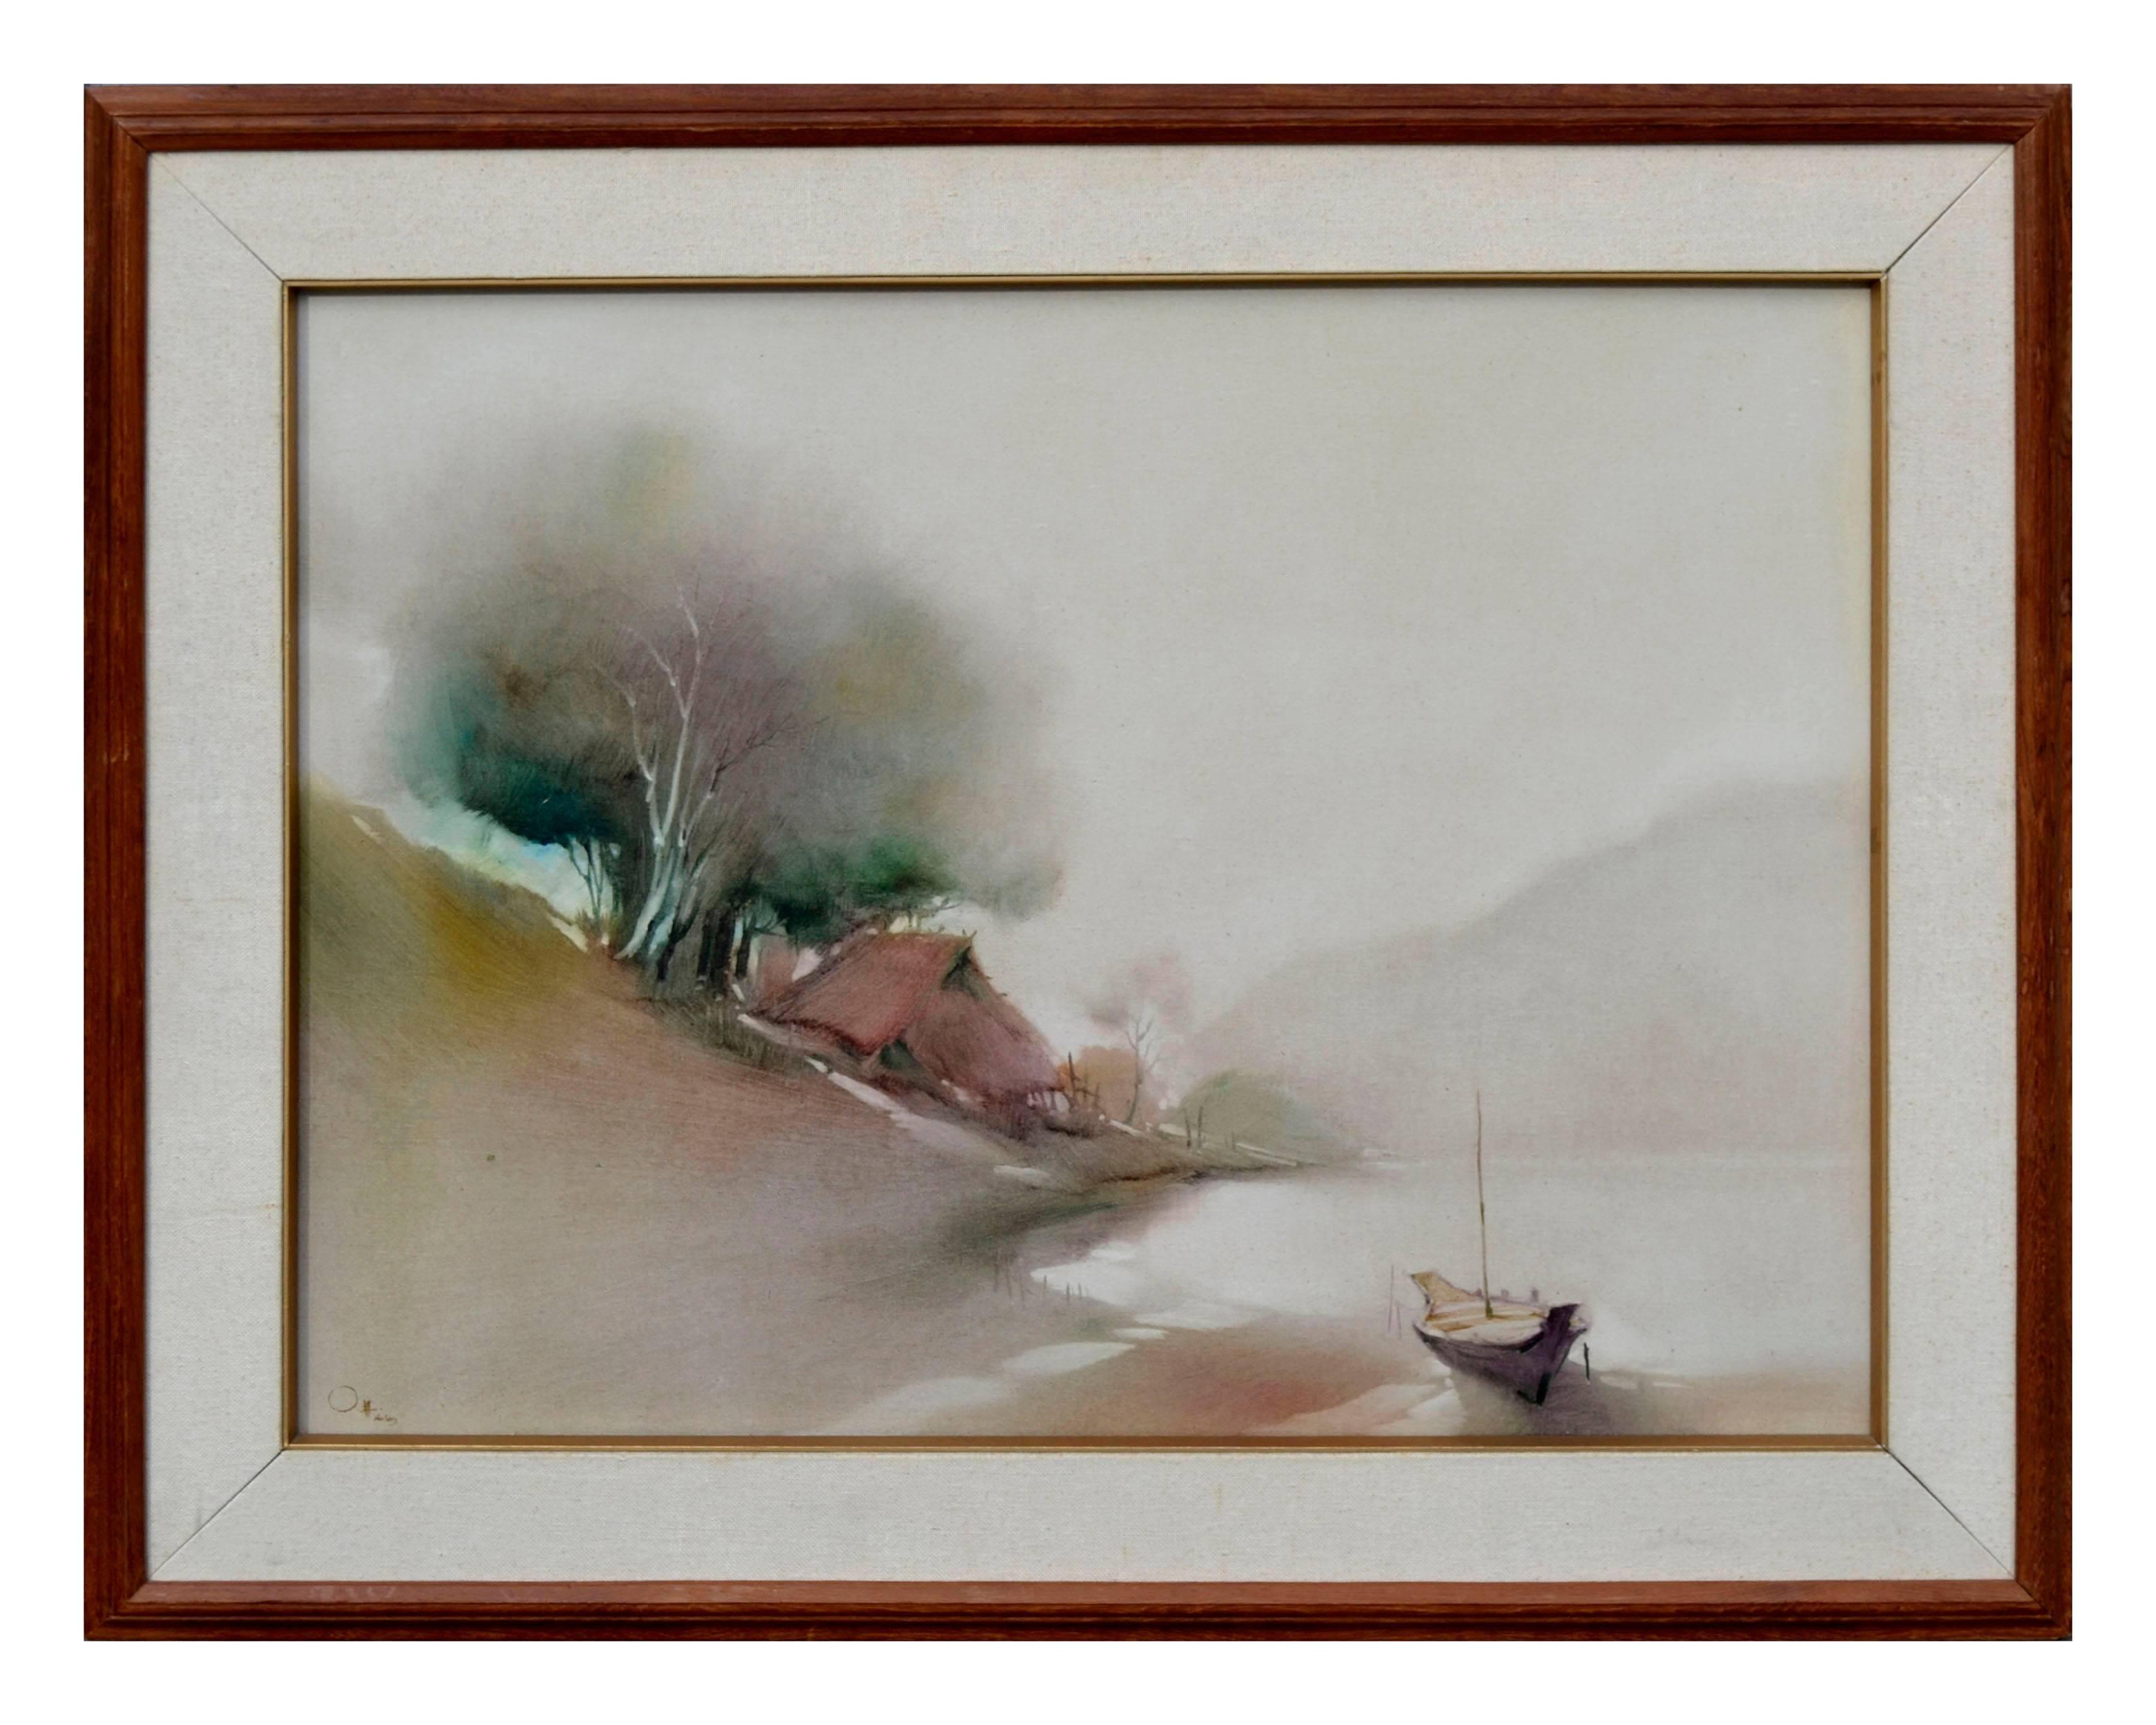 Boat at the Shore, Minimalist Landscape